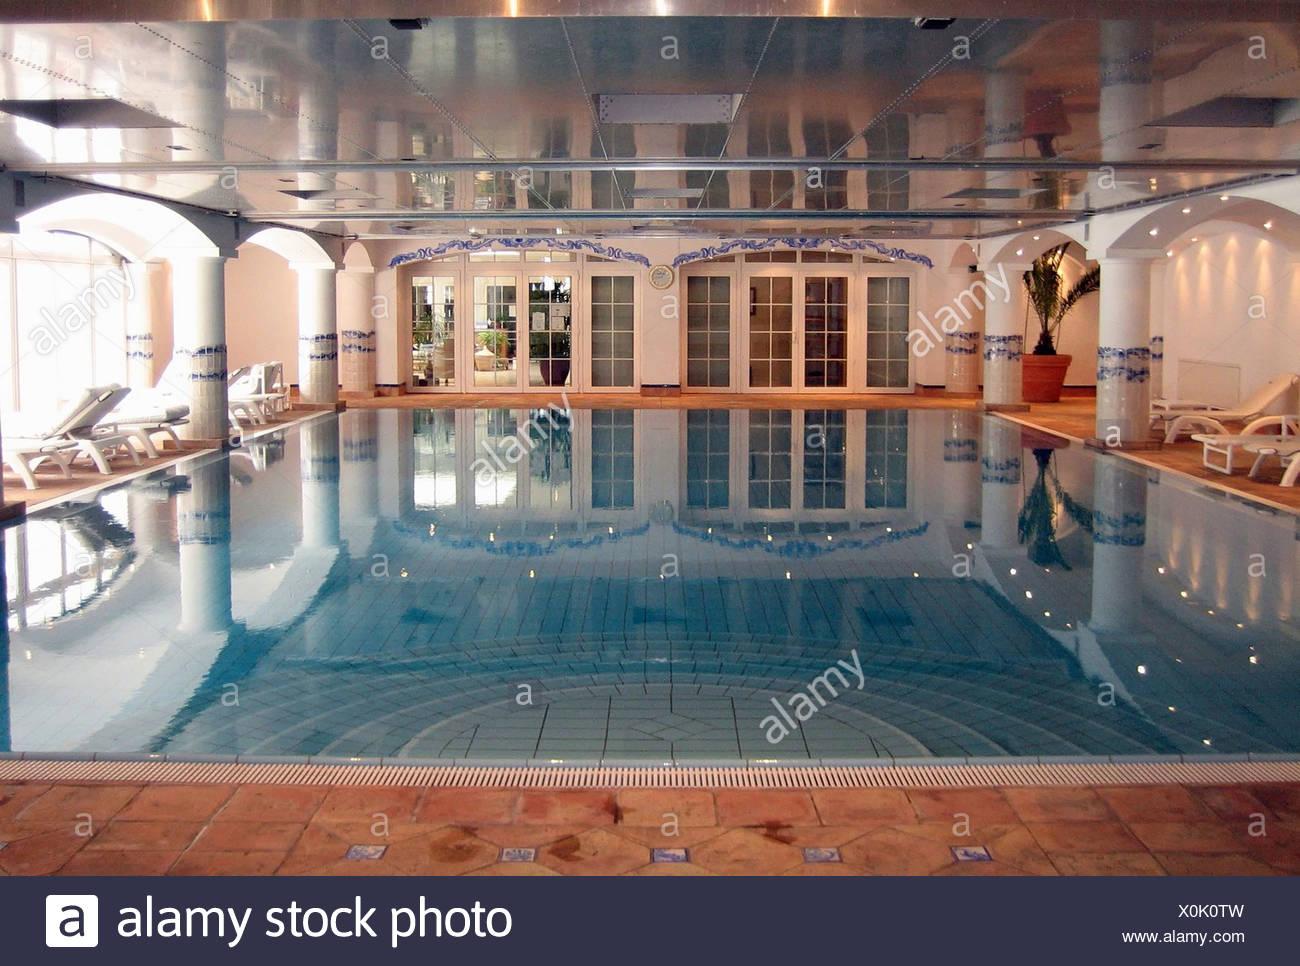 Switzerland, Indoor hotel swimming pool - Stock Image